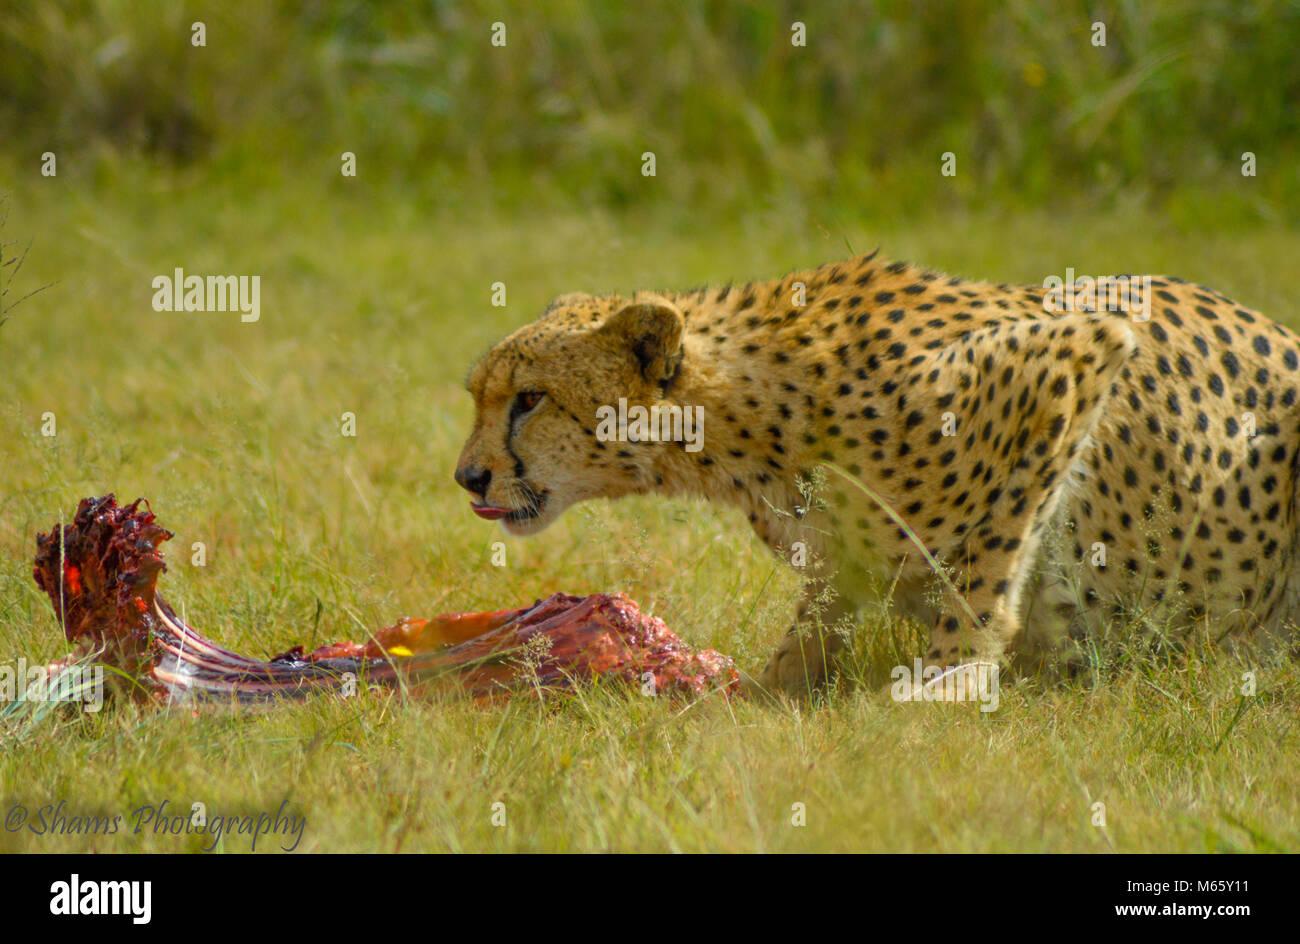 A cute cheetah in Kruger National park having food - Stock Image